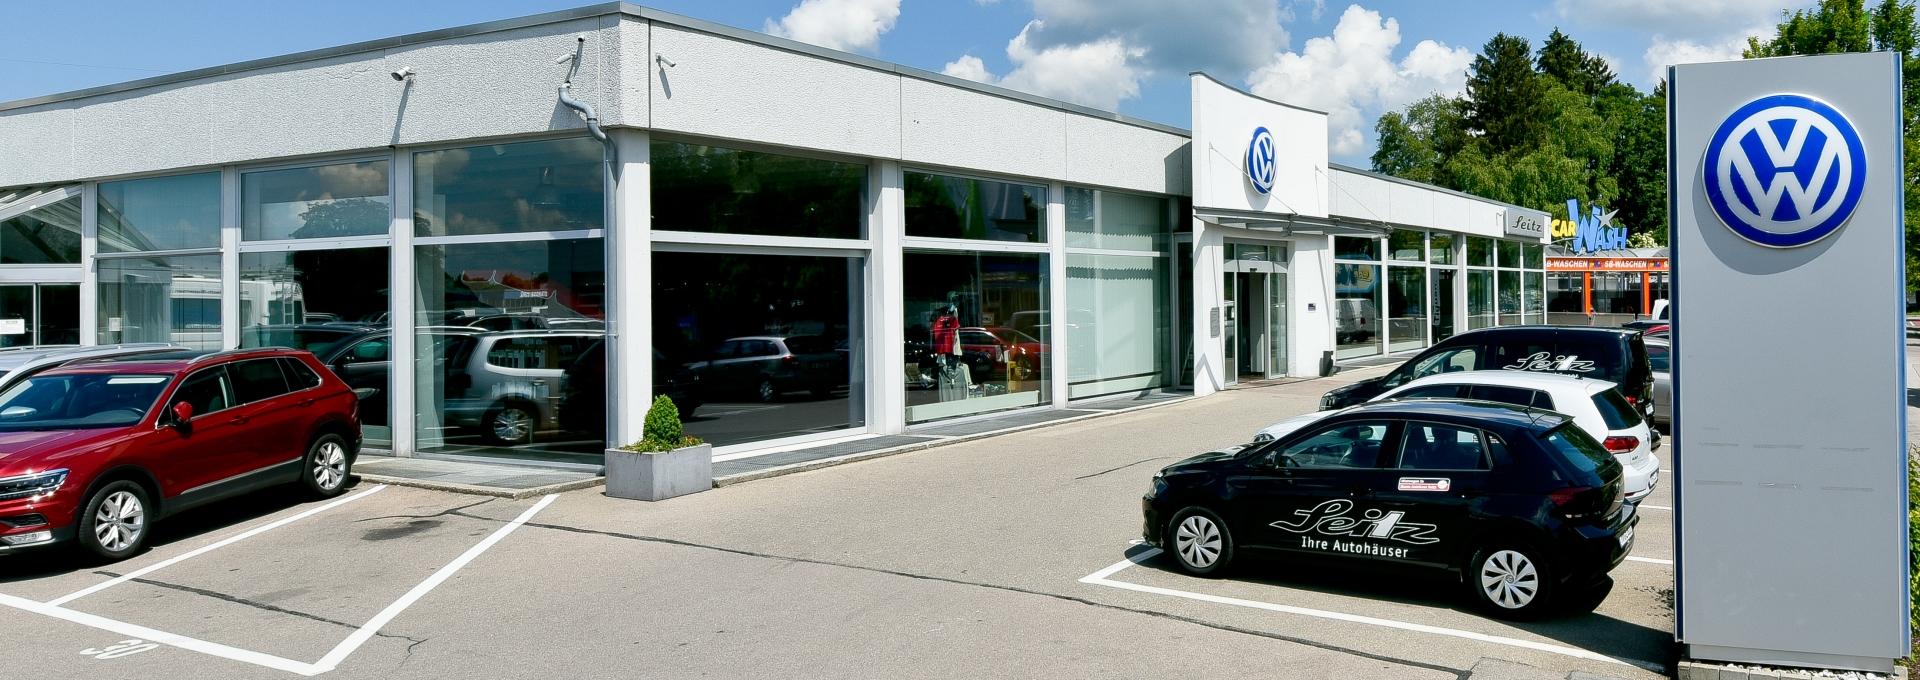 VW Vertragswerkstatt in Memmingen